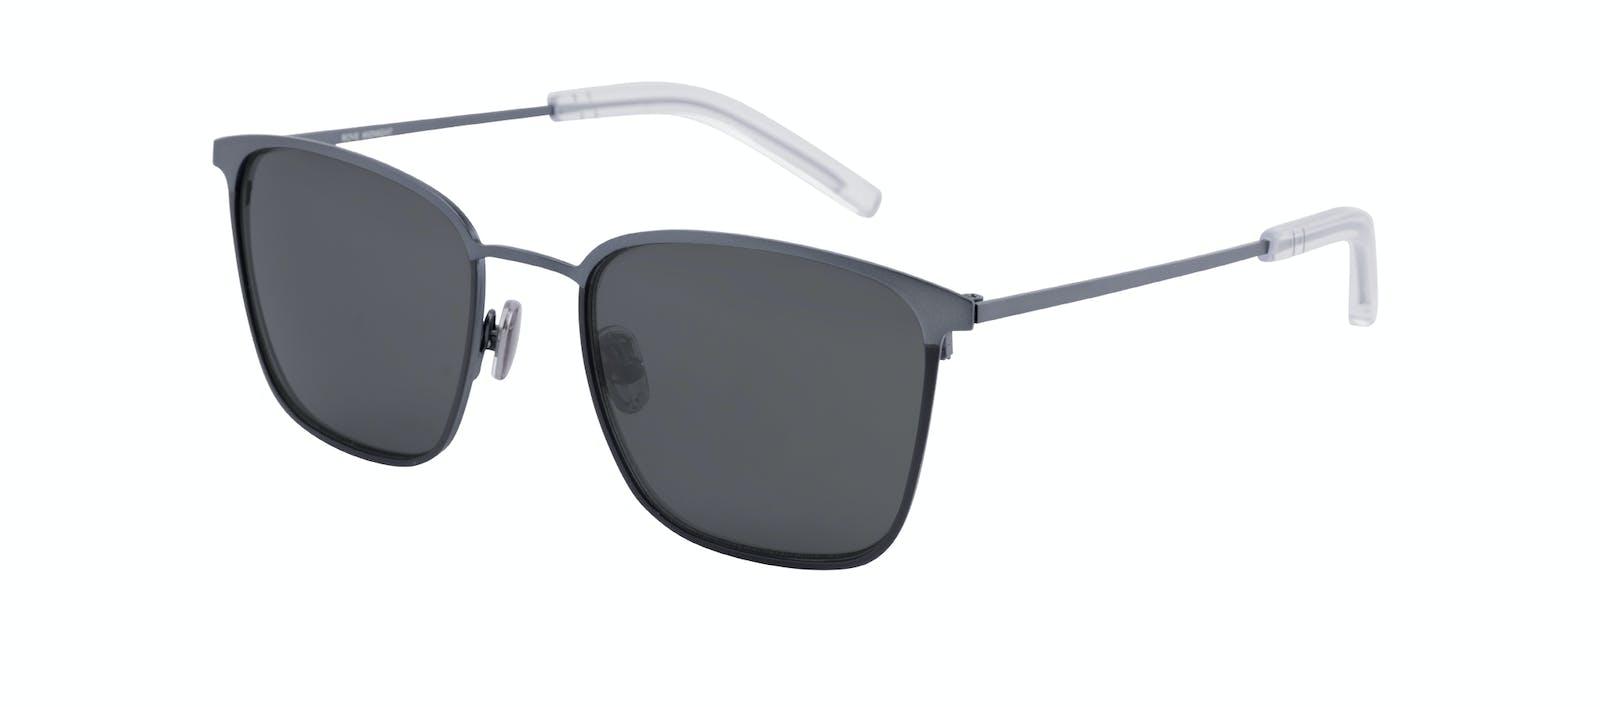 7467d8db65 Affordable Fashion Glasses Rectangle Sunglasses Men Rove Midnight Tilt